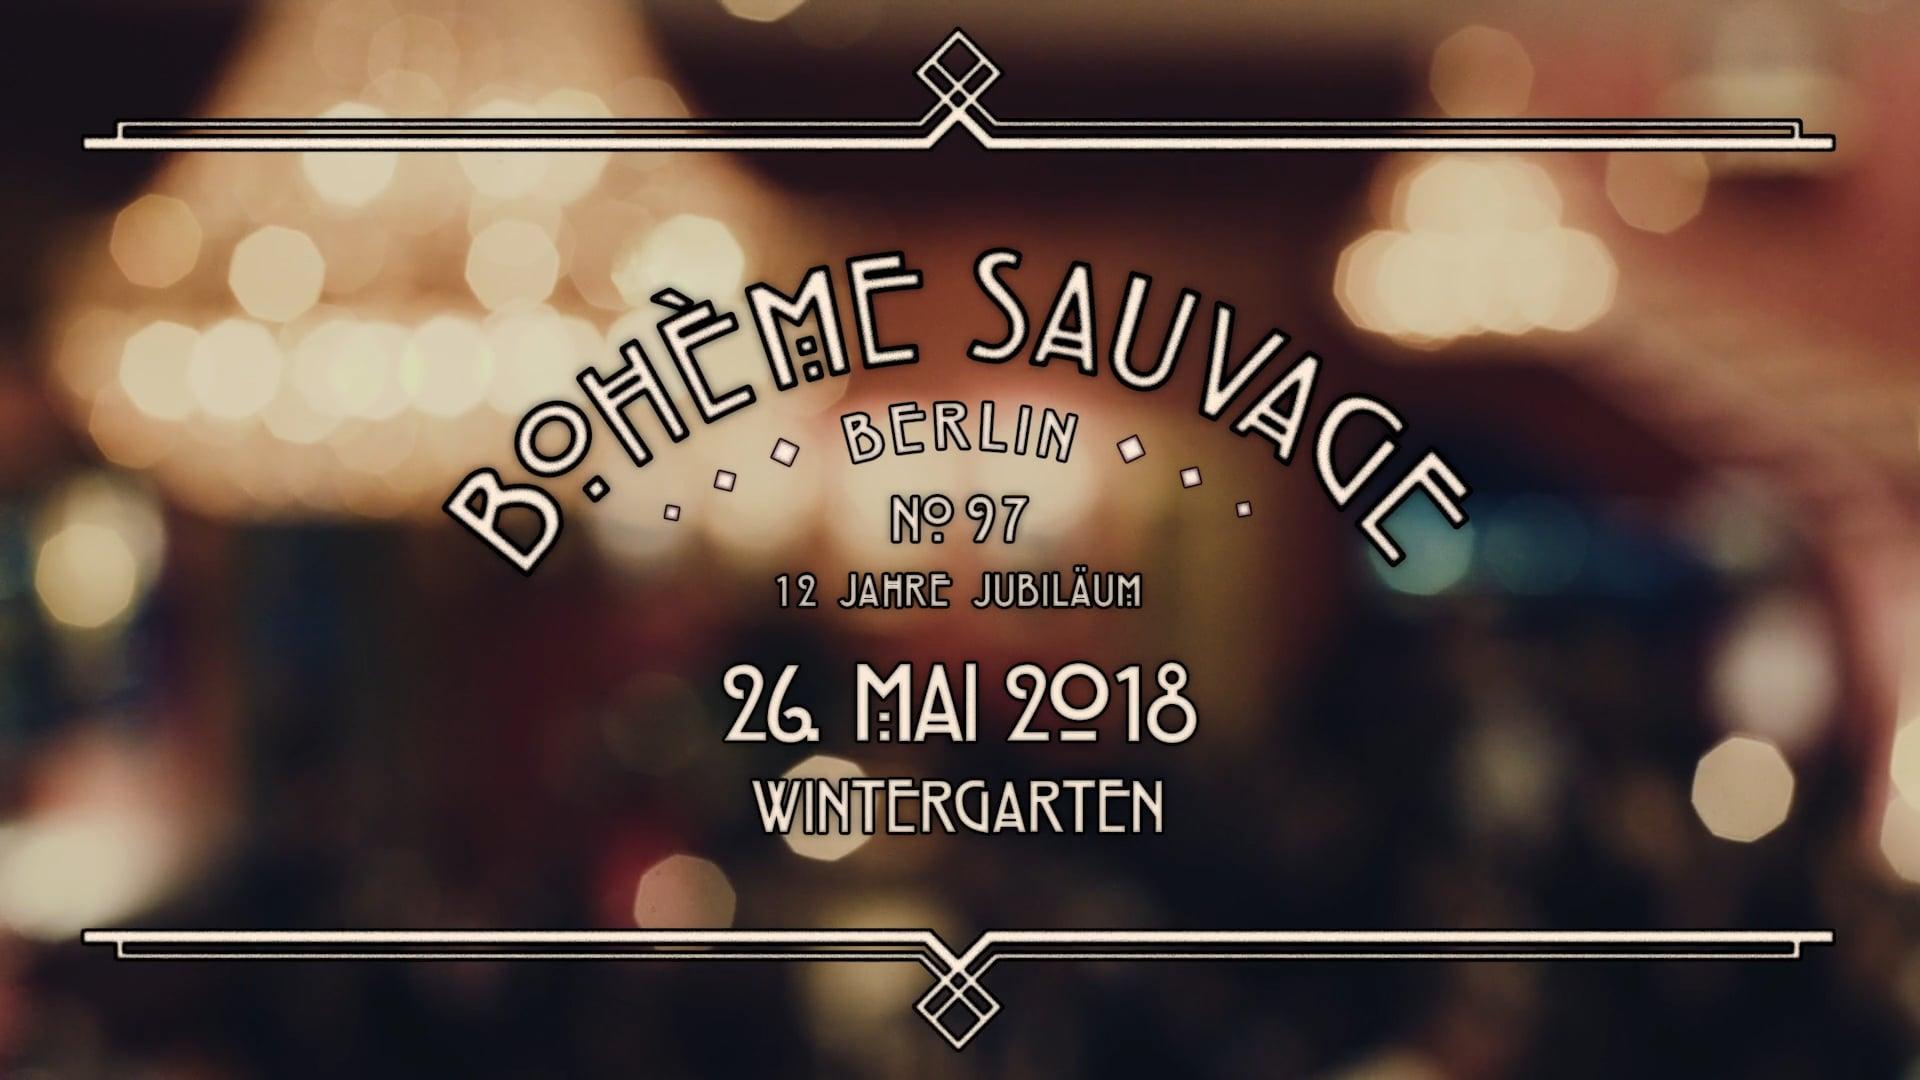 Bohème Sauvage Berlin Nº97 - 12 Jahre Jubiläum - 26. Mai 2018 - Wintergarten